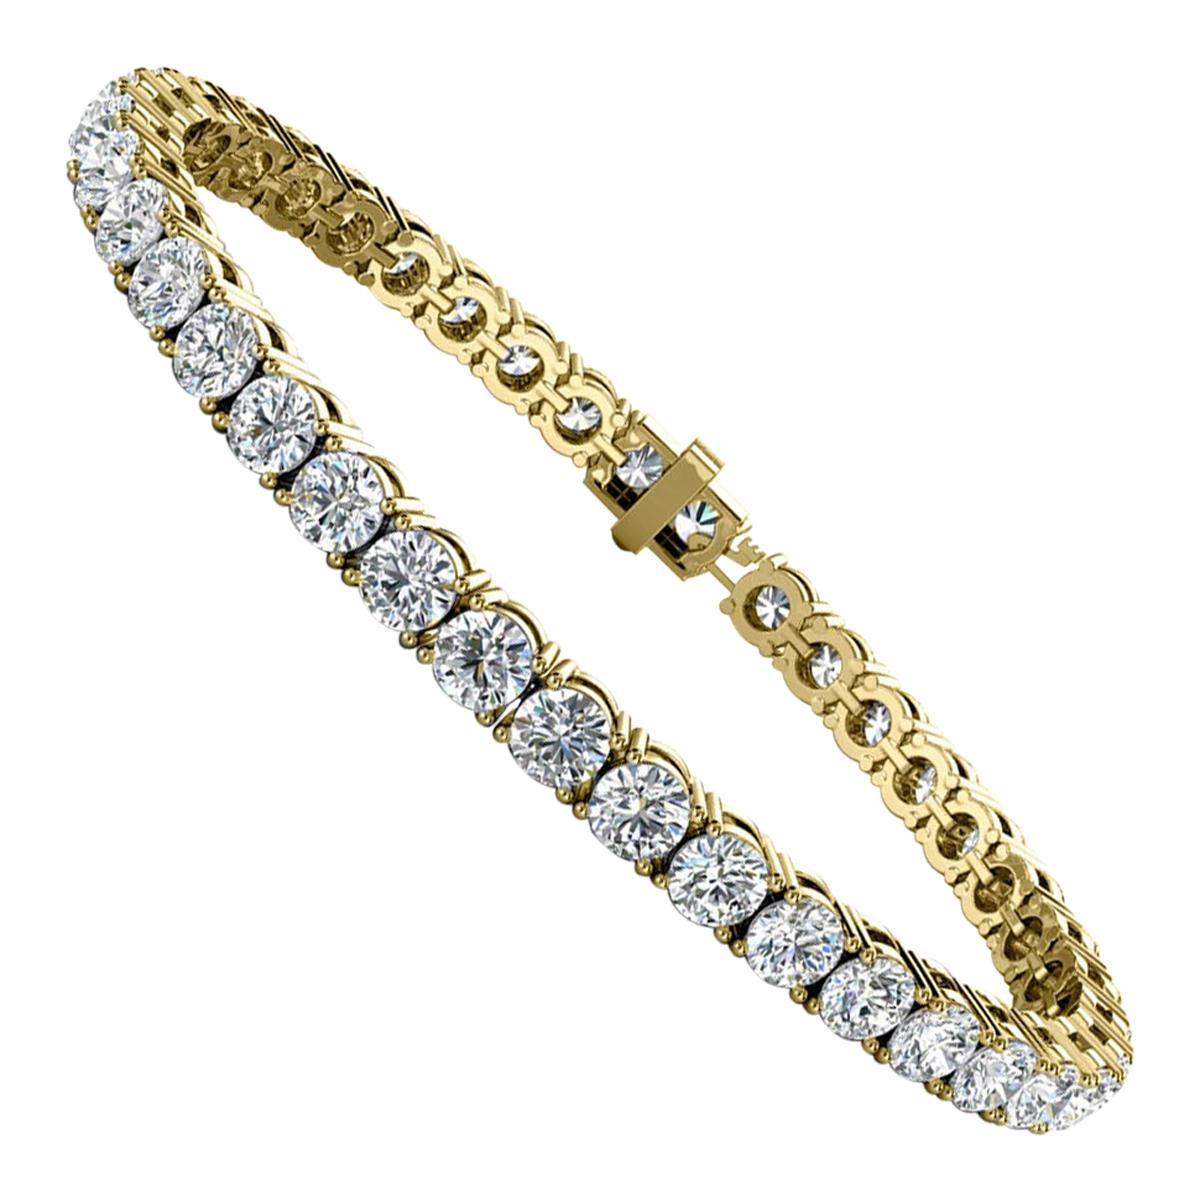 18 Karat Yellow Gold Four Prongs Diamond Tennis Bracelet '10 Carat'